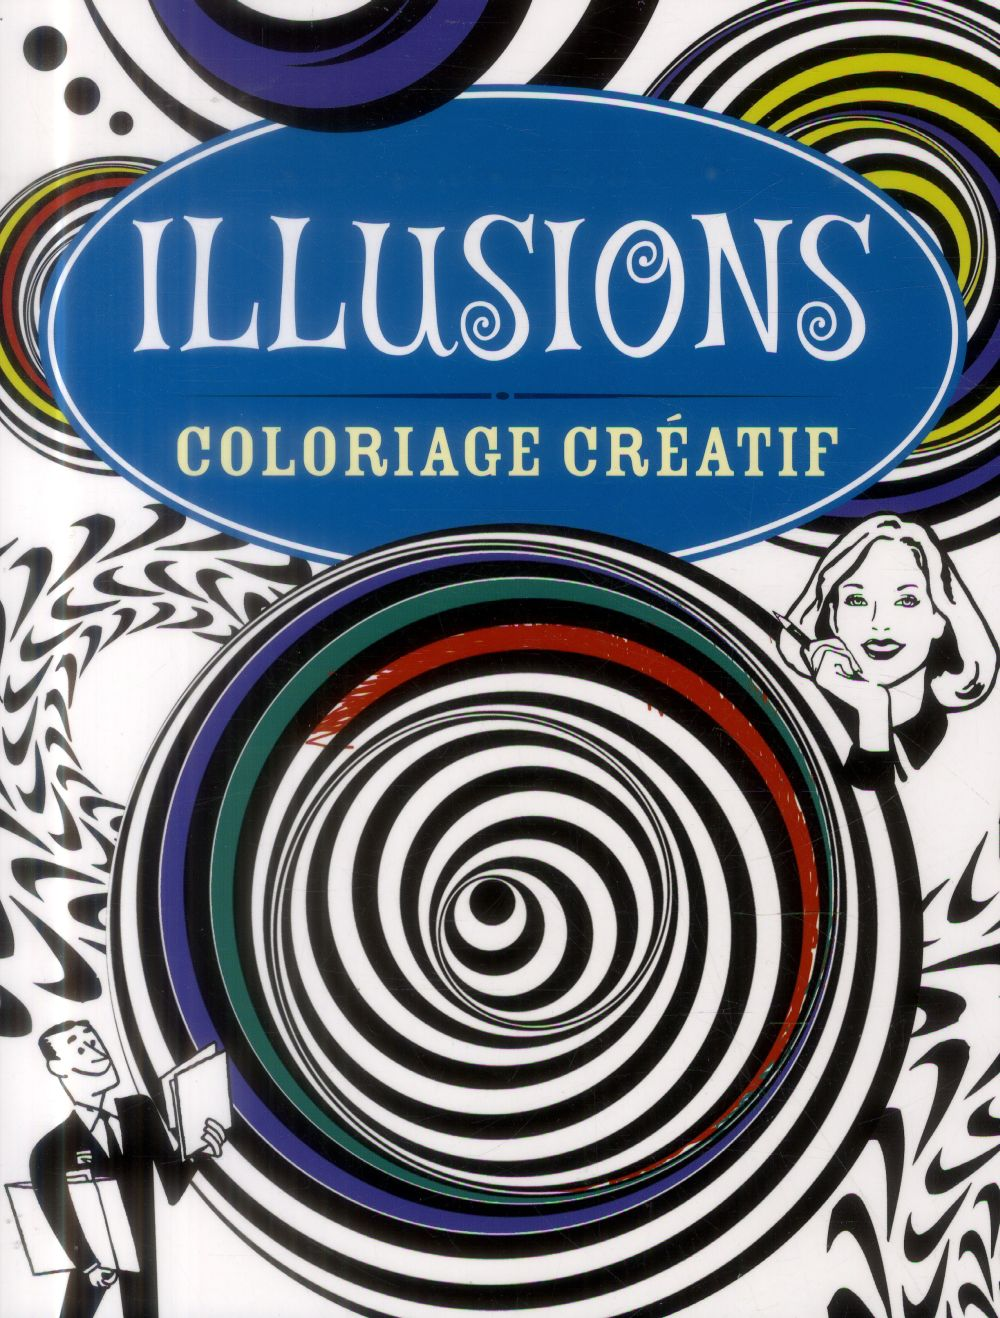 ILLUSIONS - COLORIAGE CREATIF